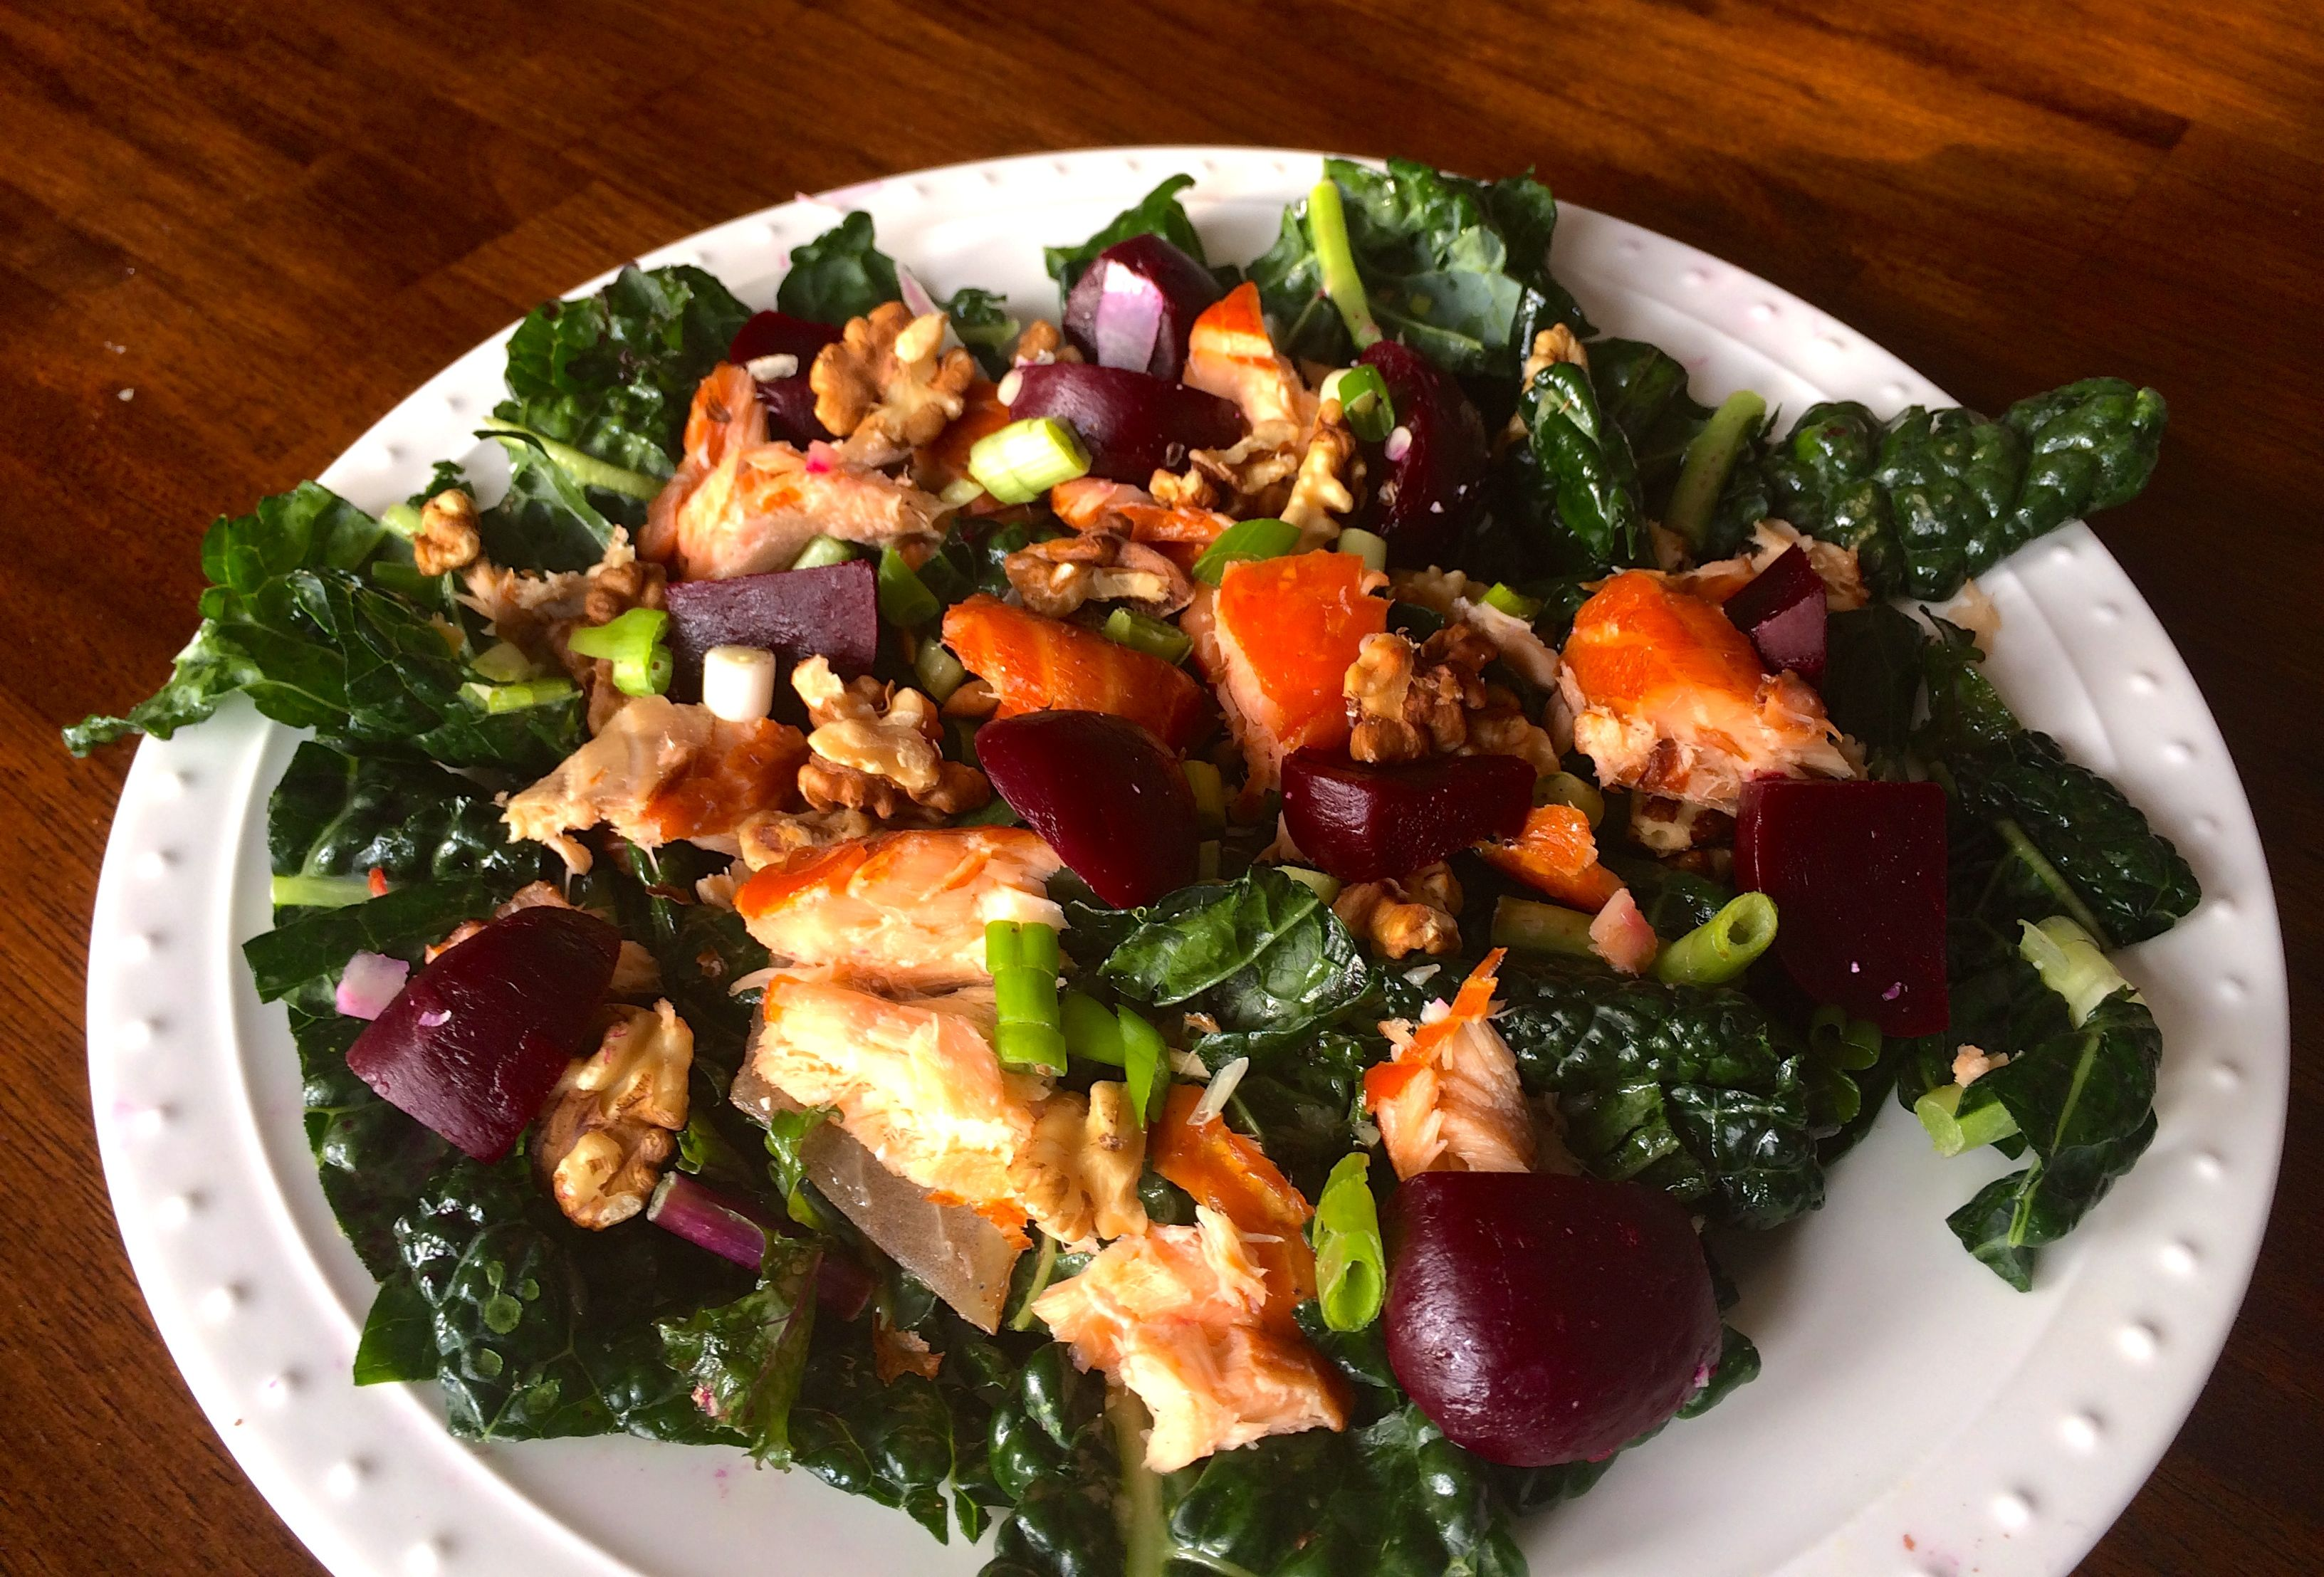 Salmon, Kale, and Beet Salad